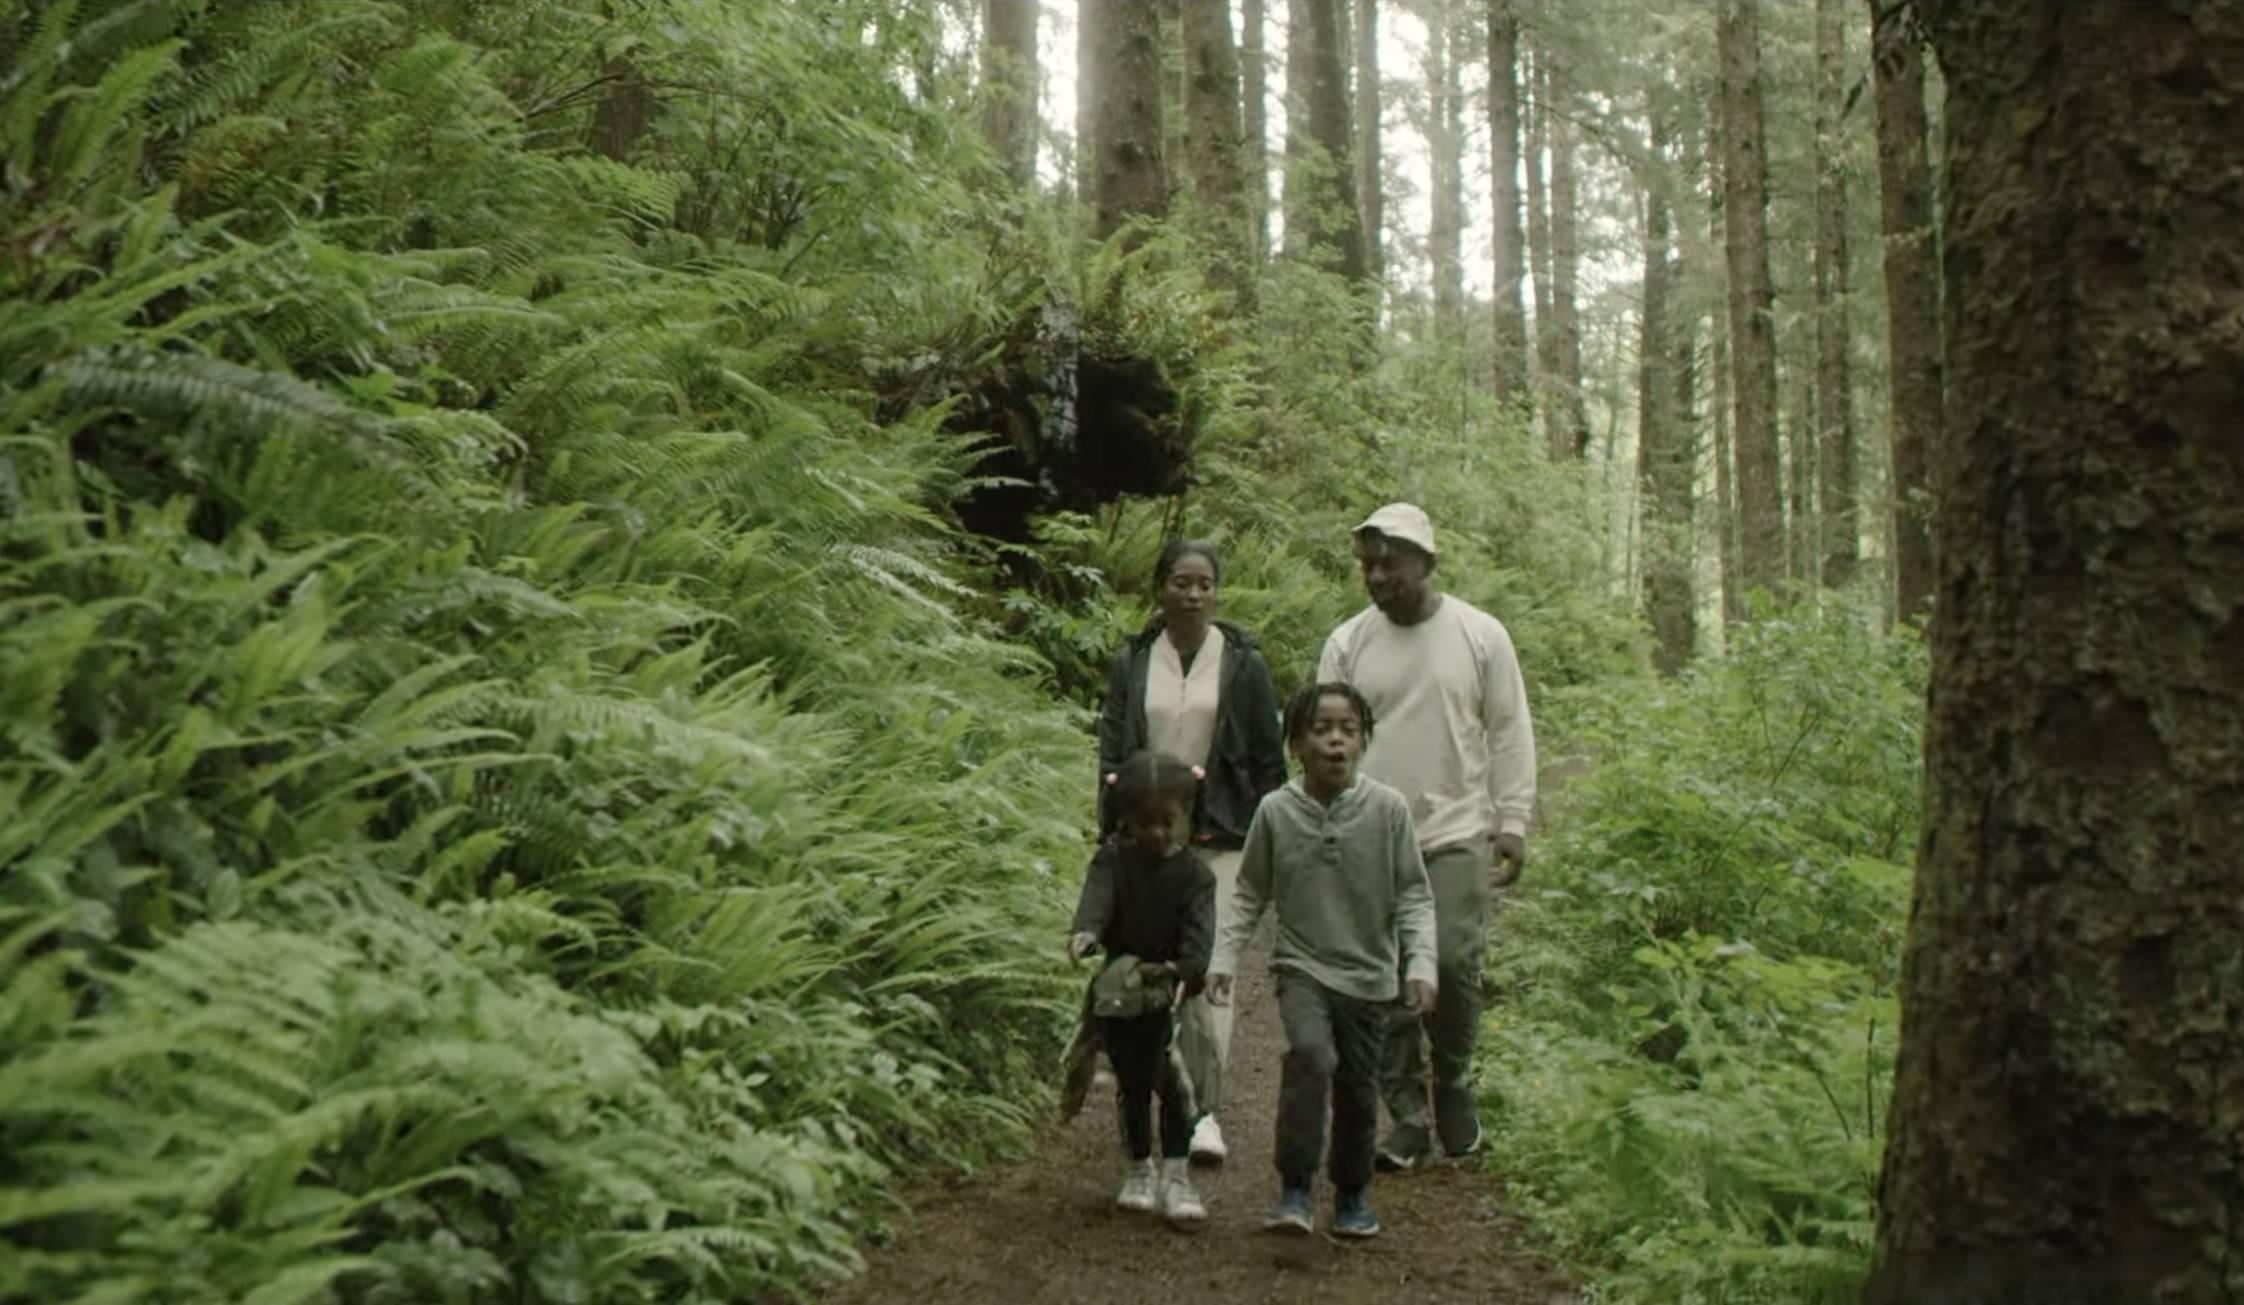 rashad and his family hiking in Oregon